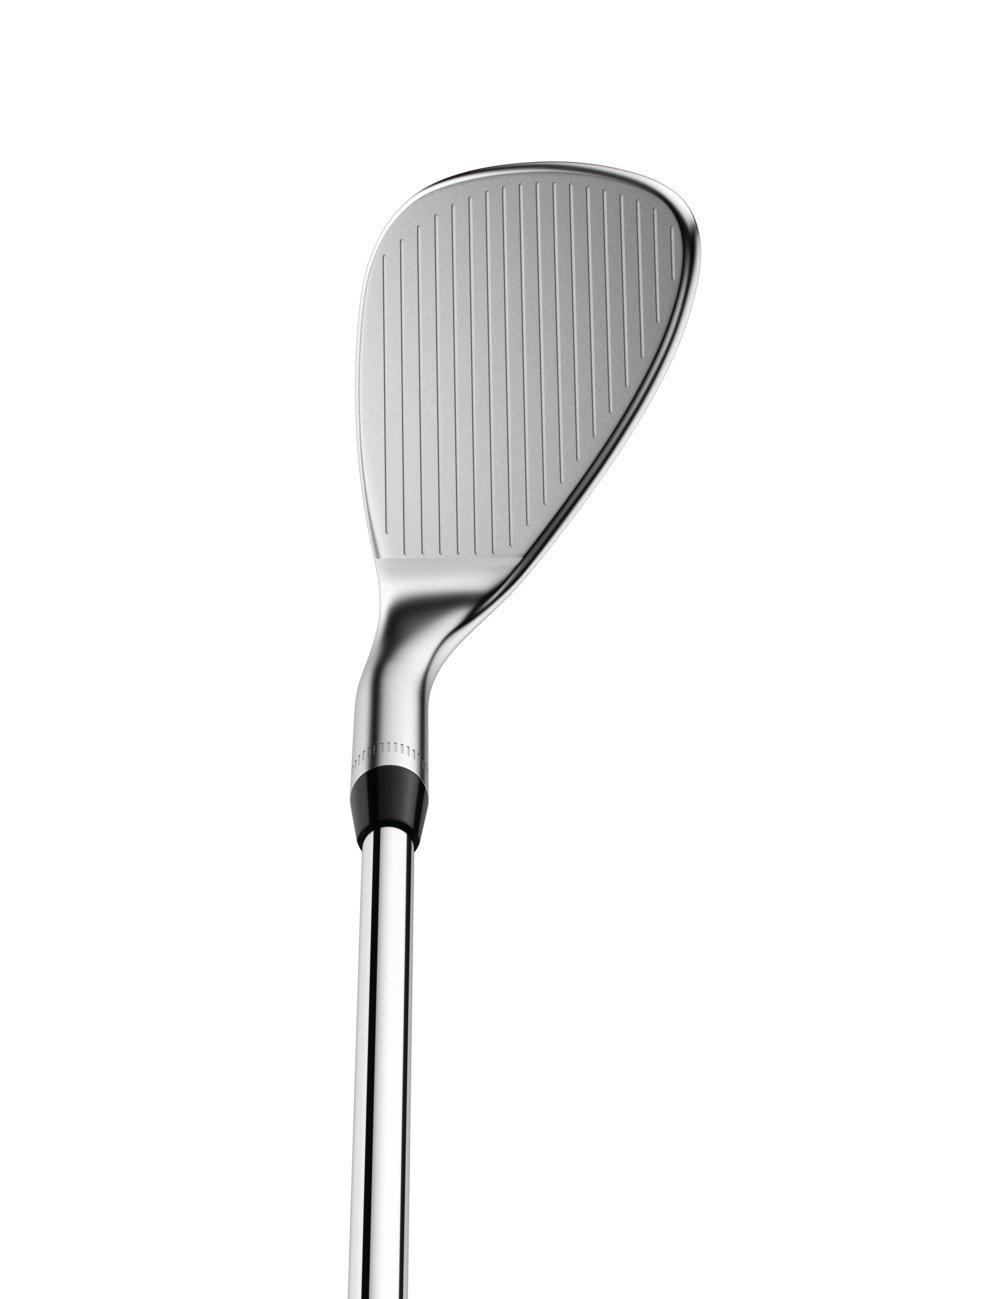 Callaway-Mack-Daddy-PM-Wedge-Phil-Mickelson-Golf-Wedge-U-Grind-Pick-Specs thumbnail 3